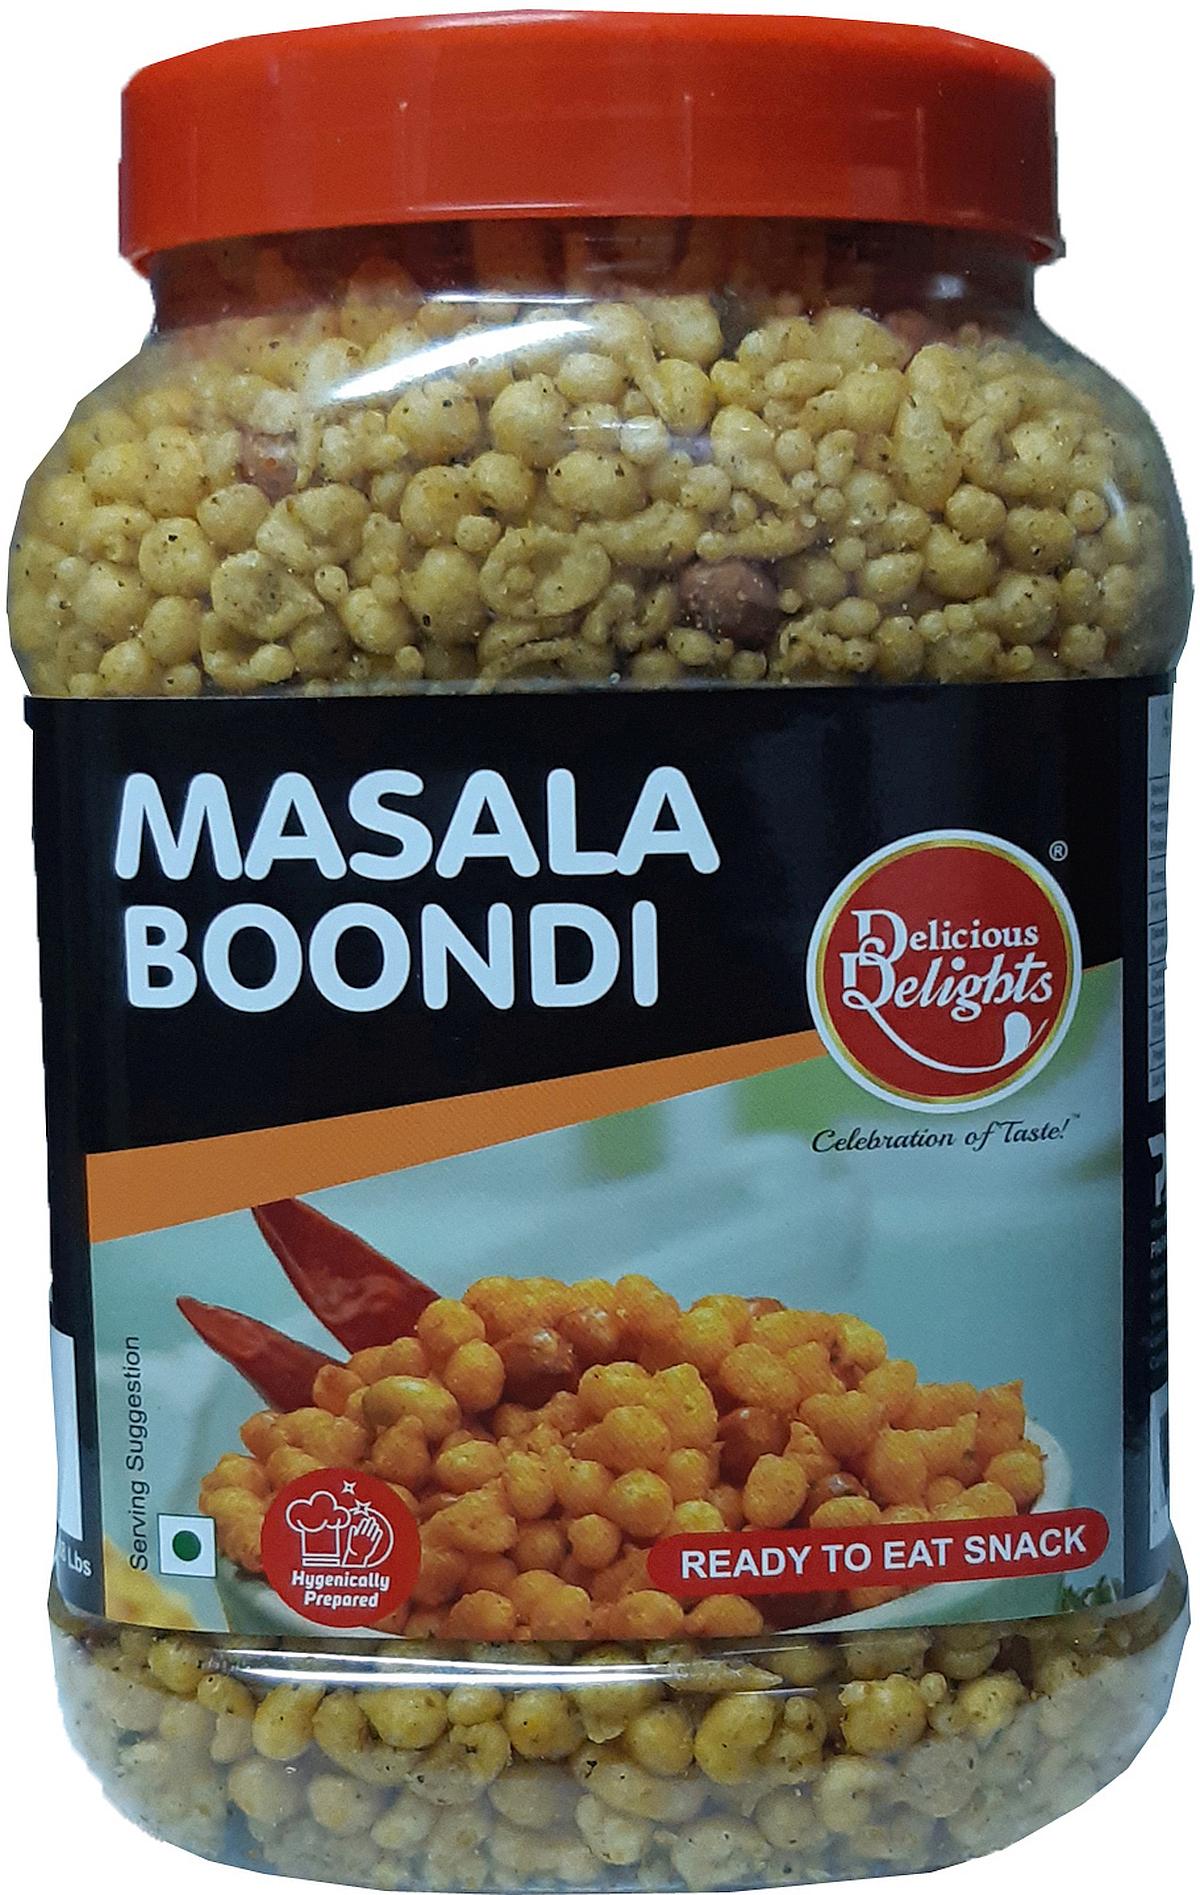 Delicious Delights Boondi Masala